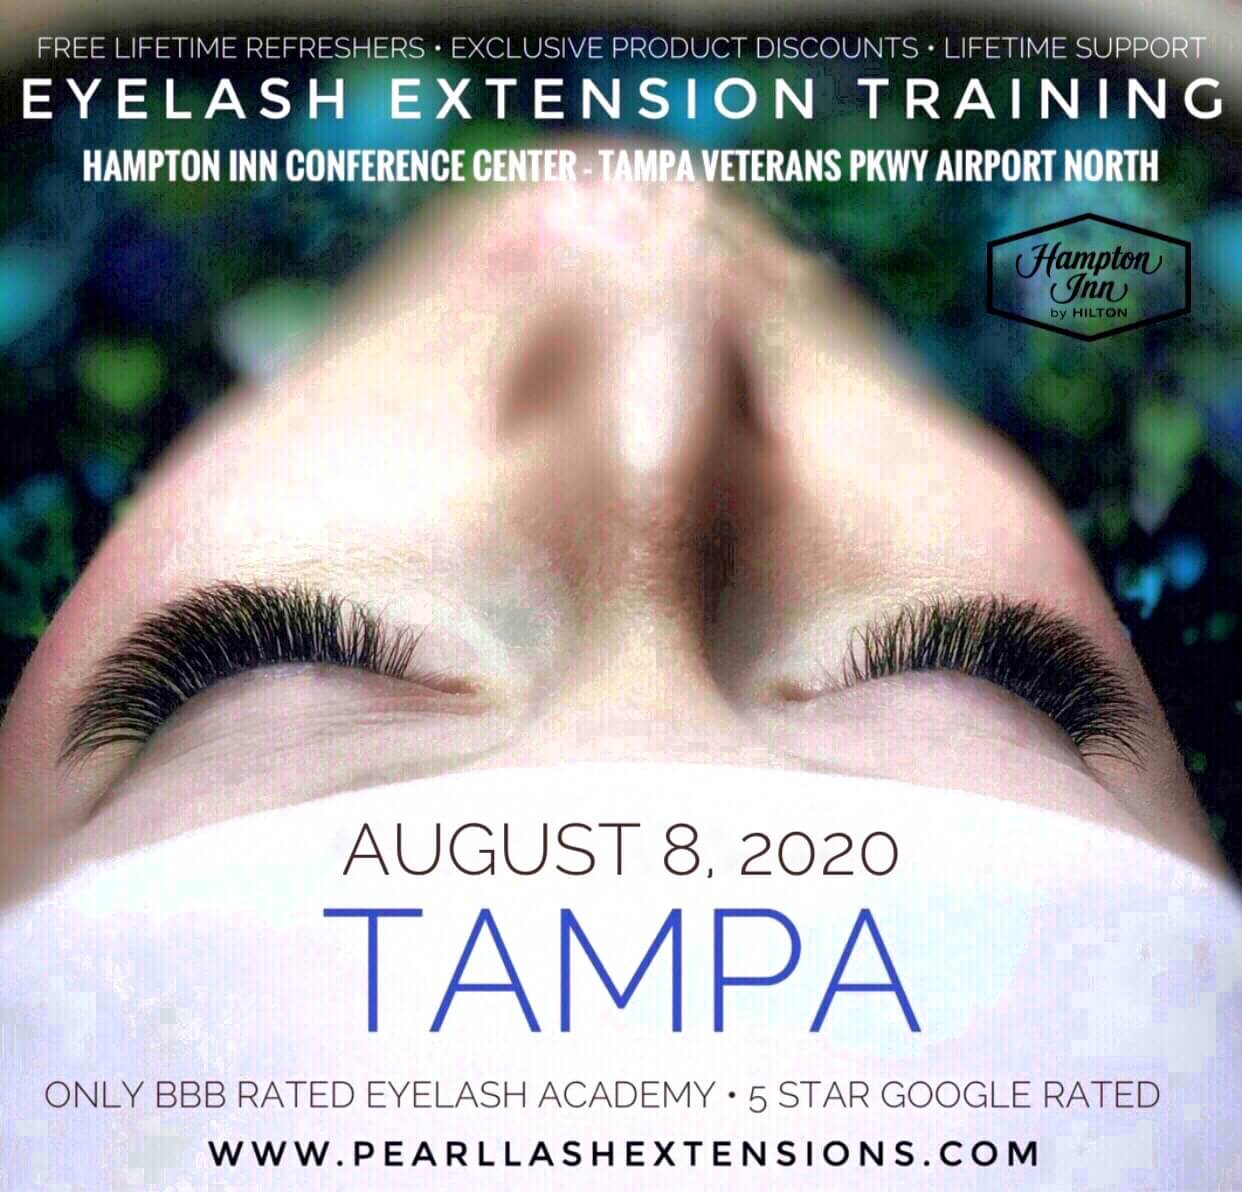 Tampa Classic Eyelash Extension Training by Pearl Lash